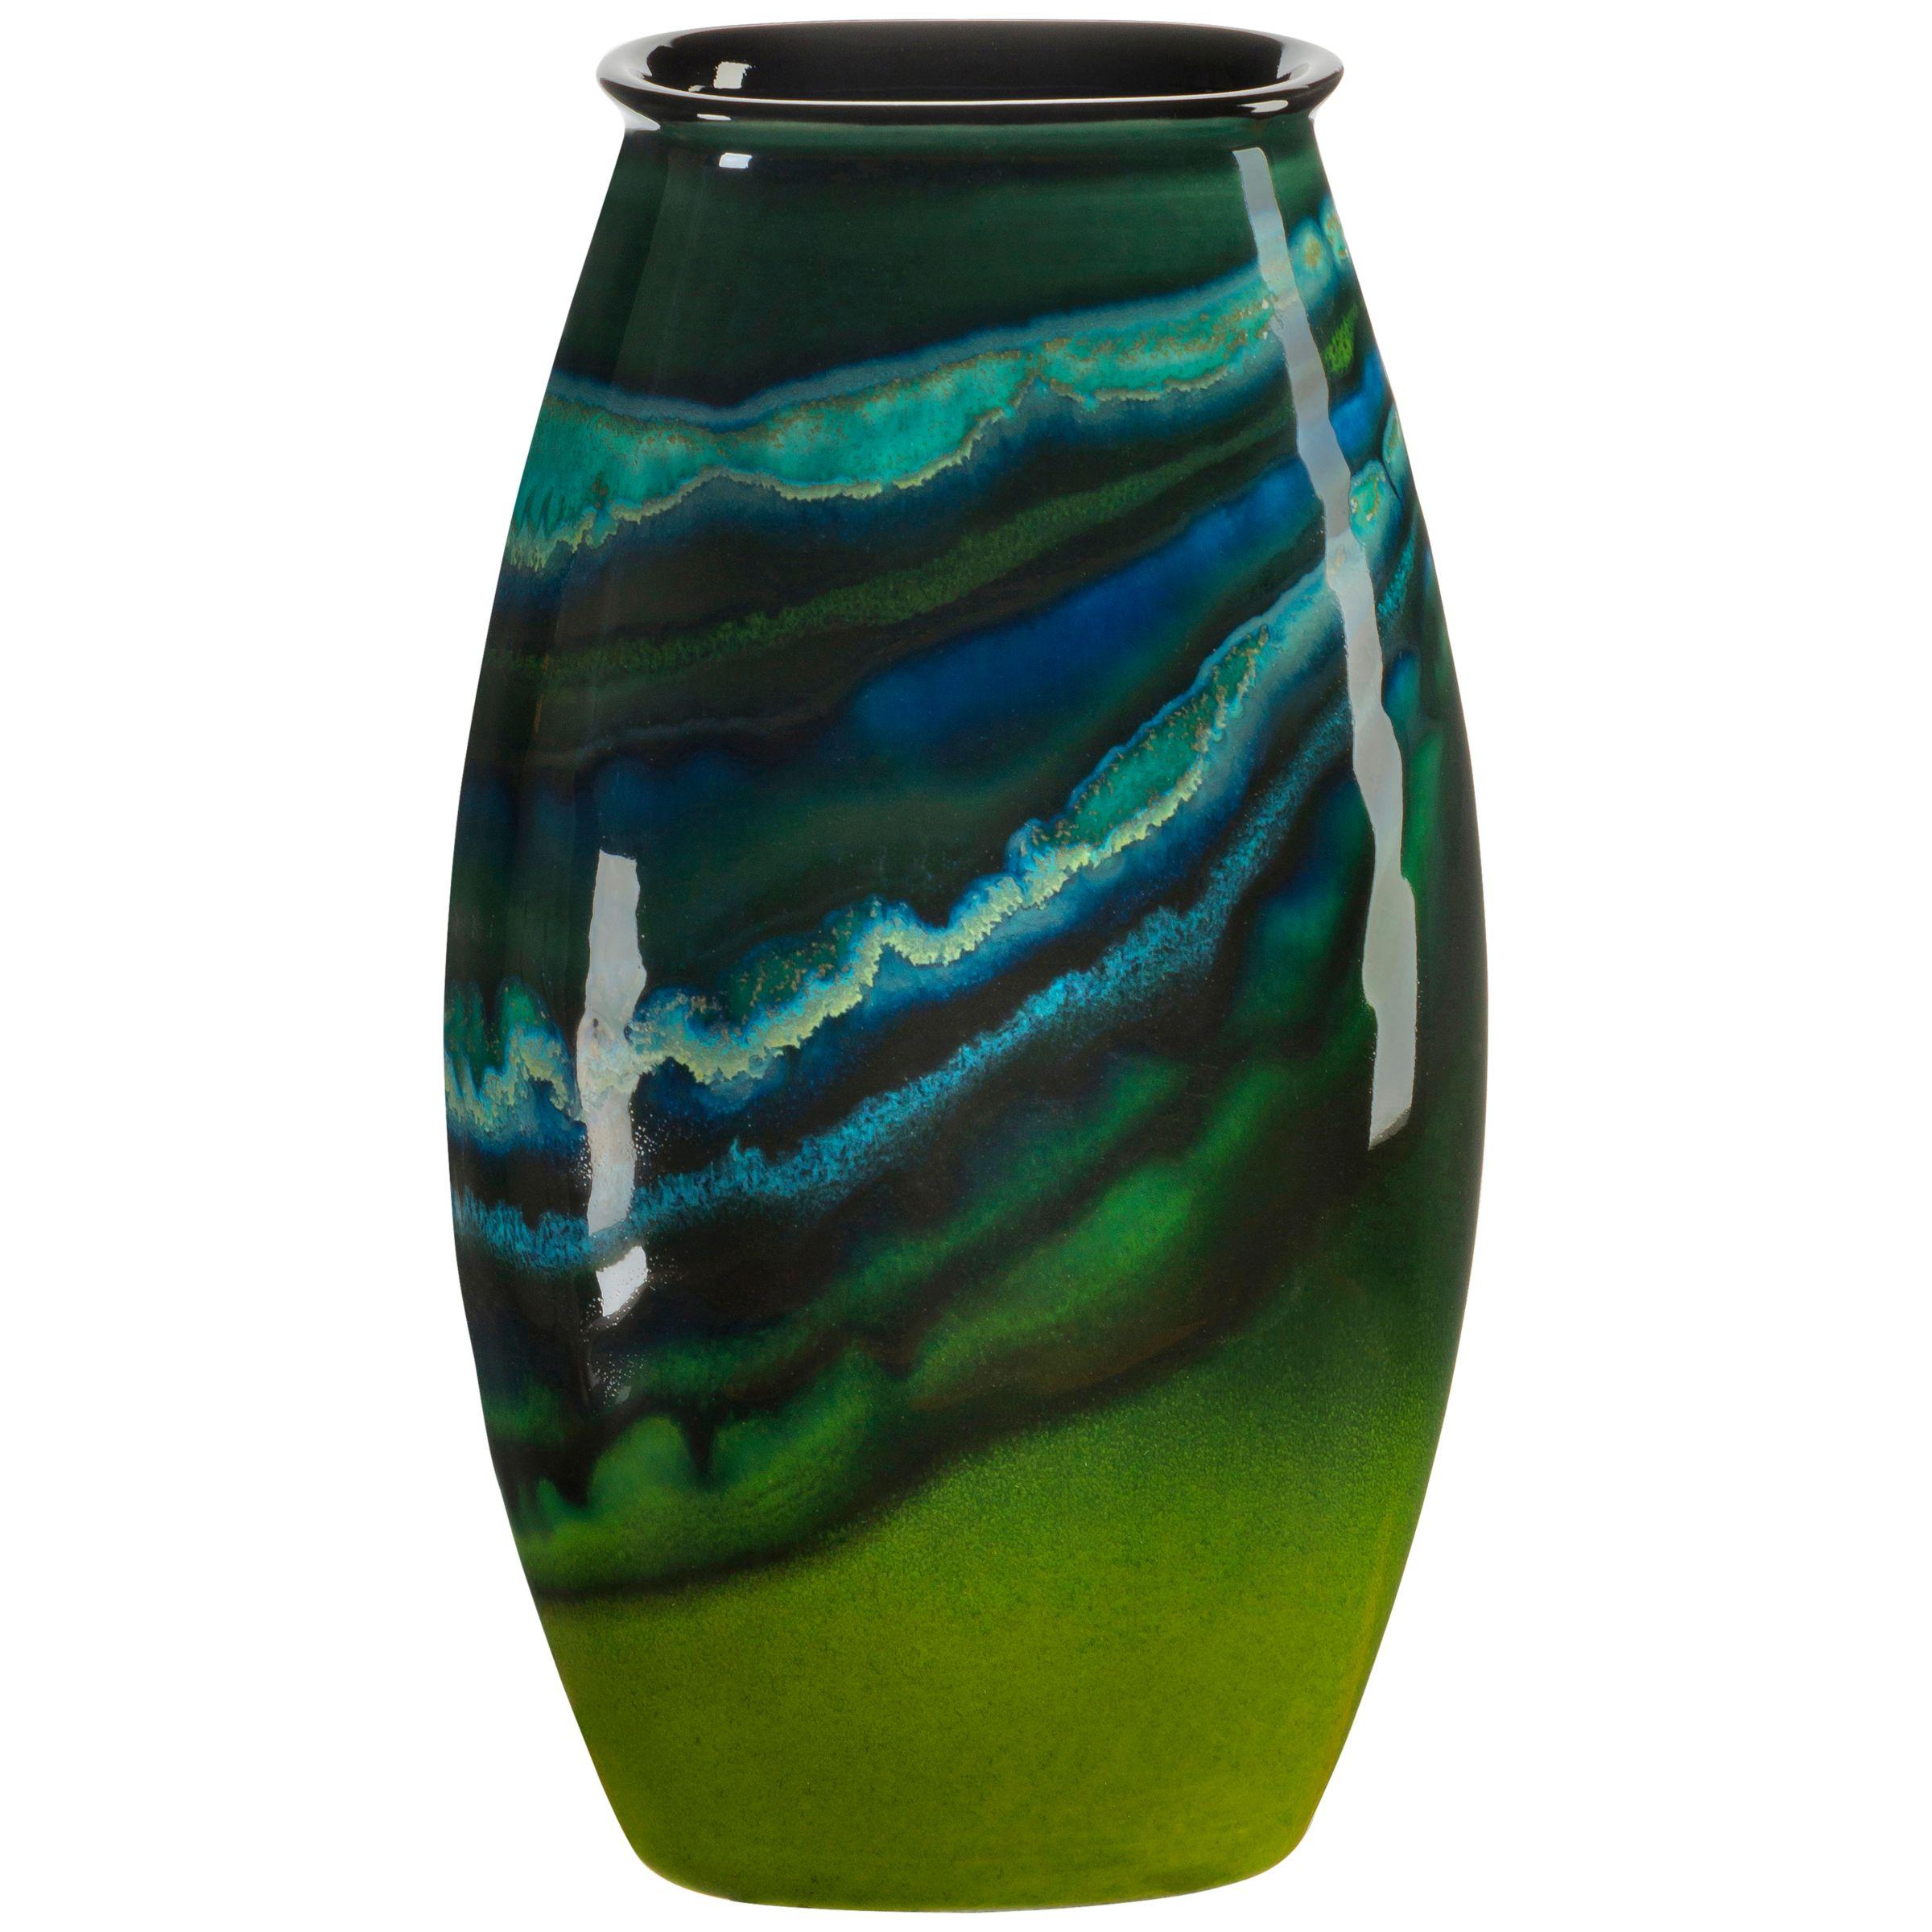 Poole Pottery Poole Pottery Maya Manhattan Vase, H26cm